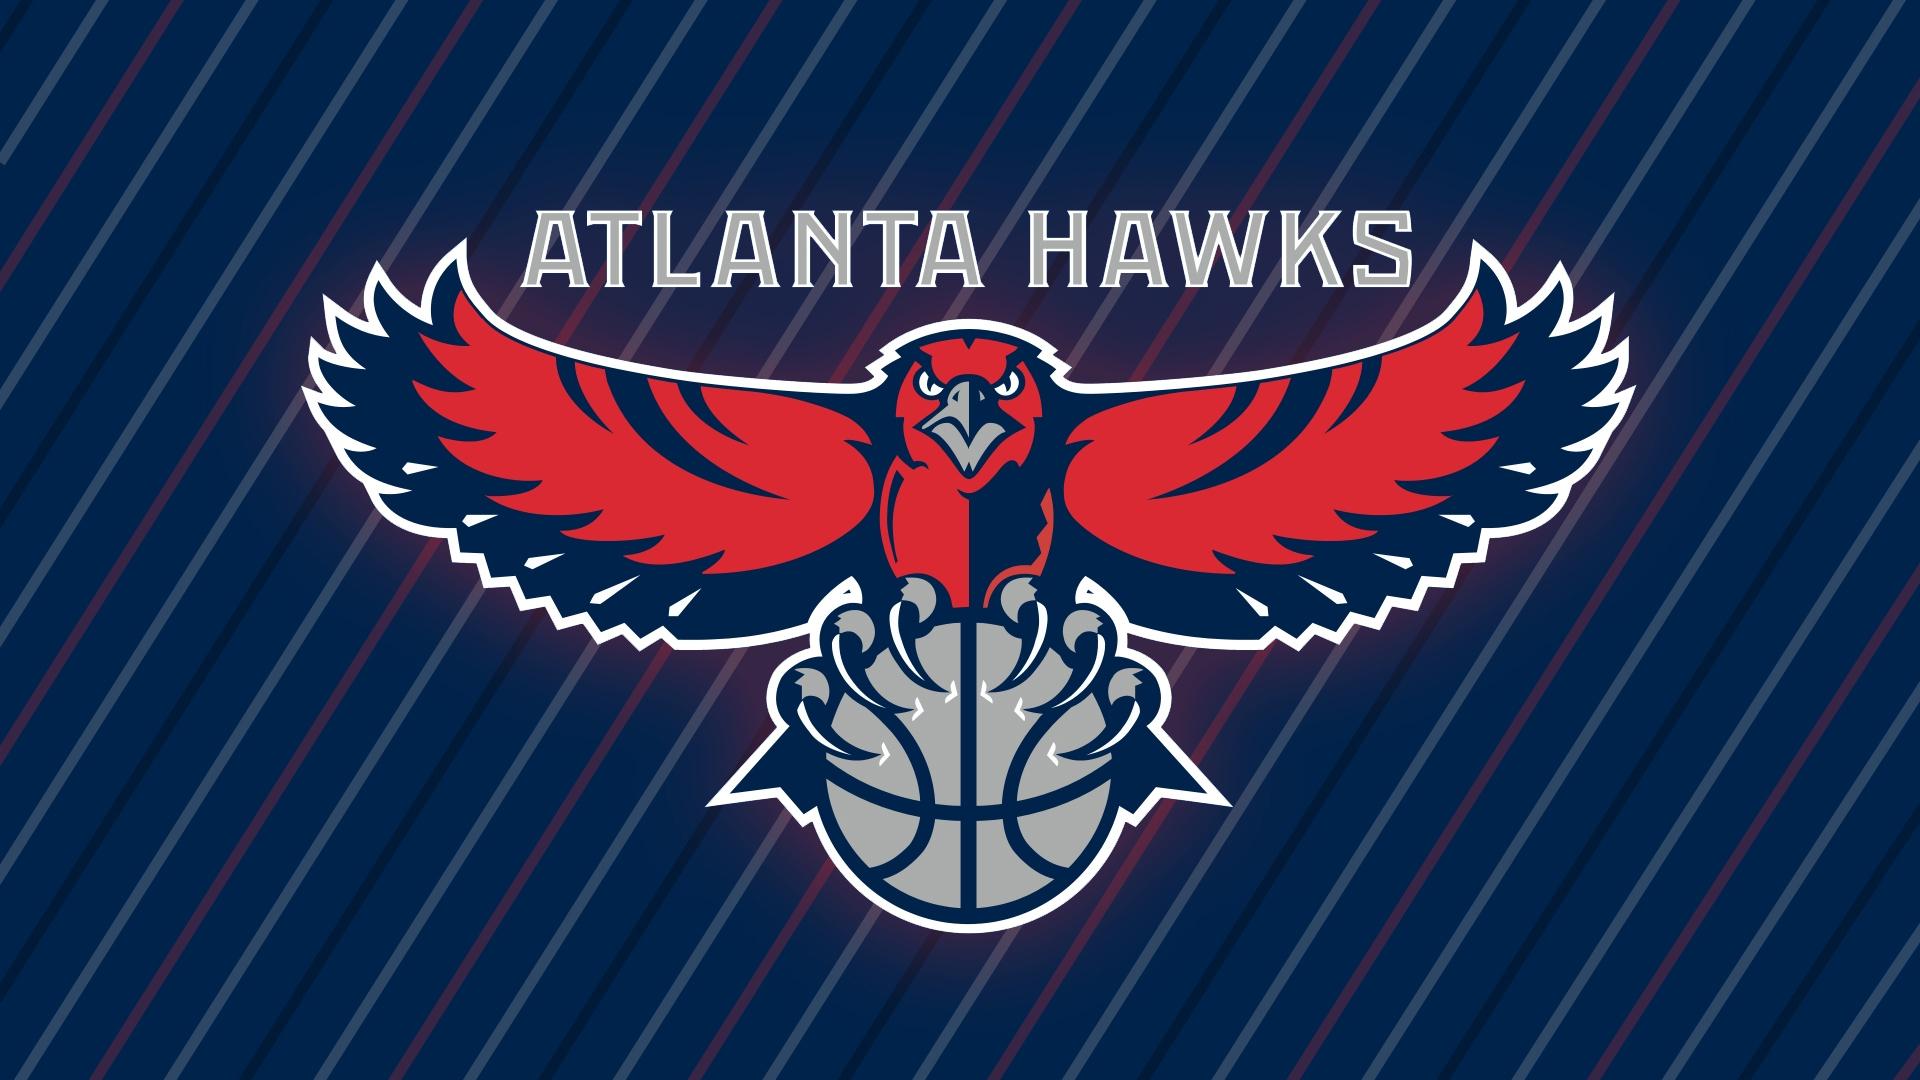 Atlanta Hawks Wallpapers Hq